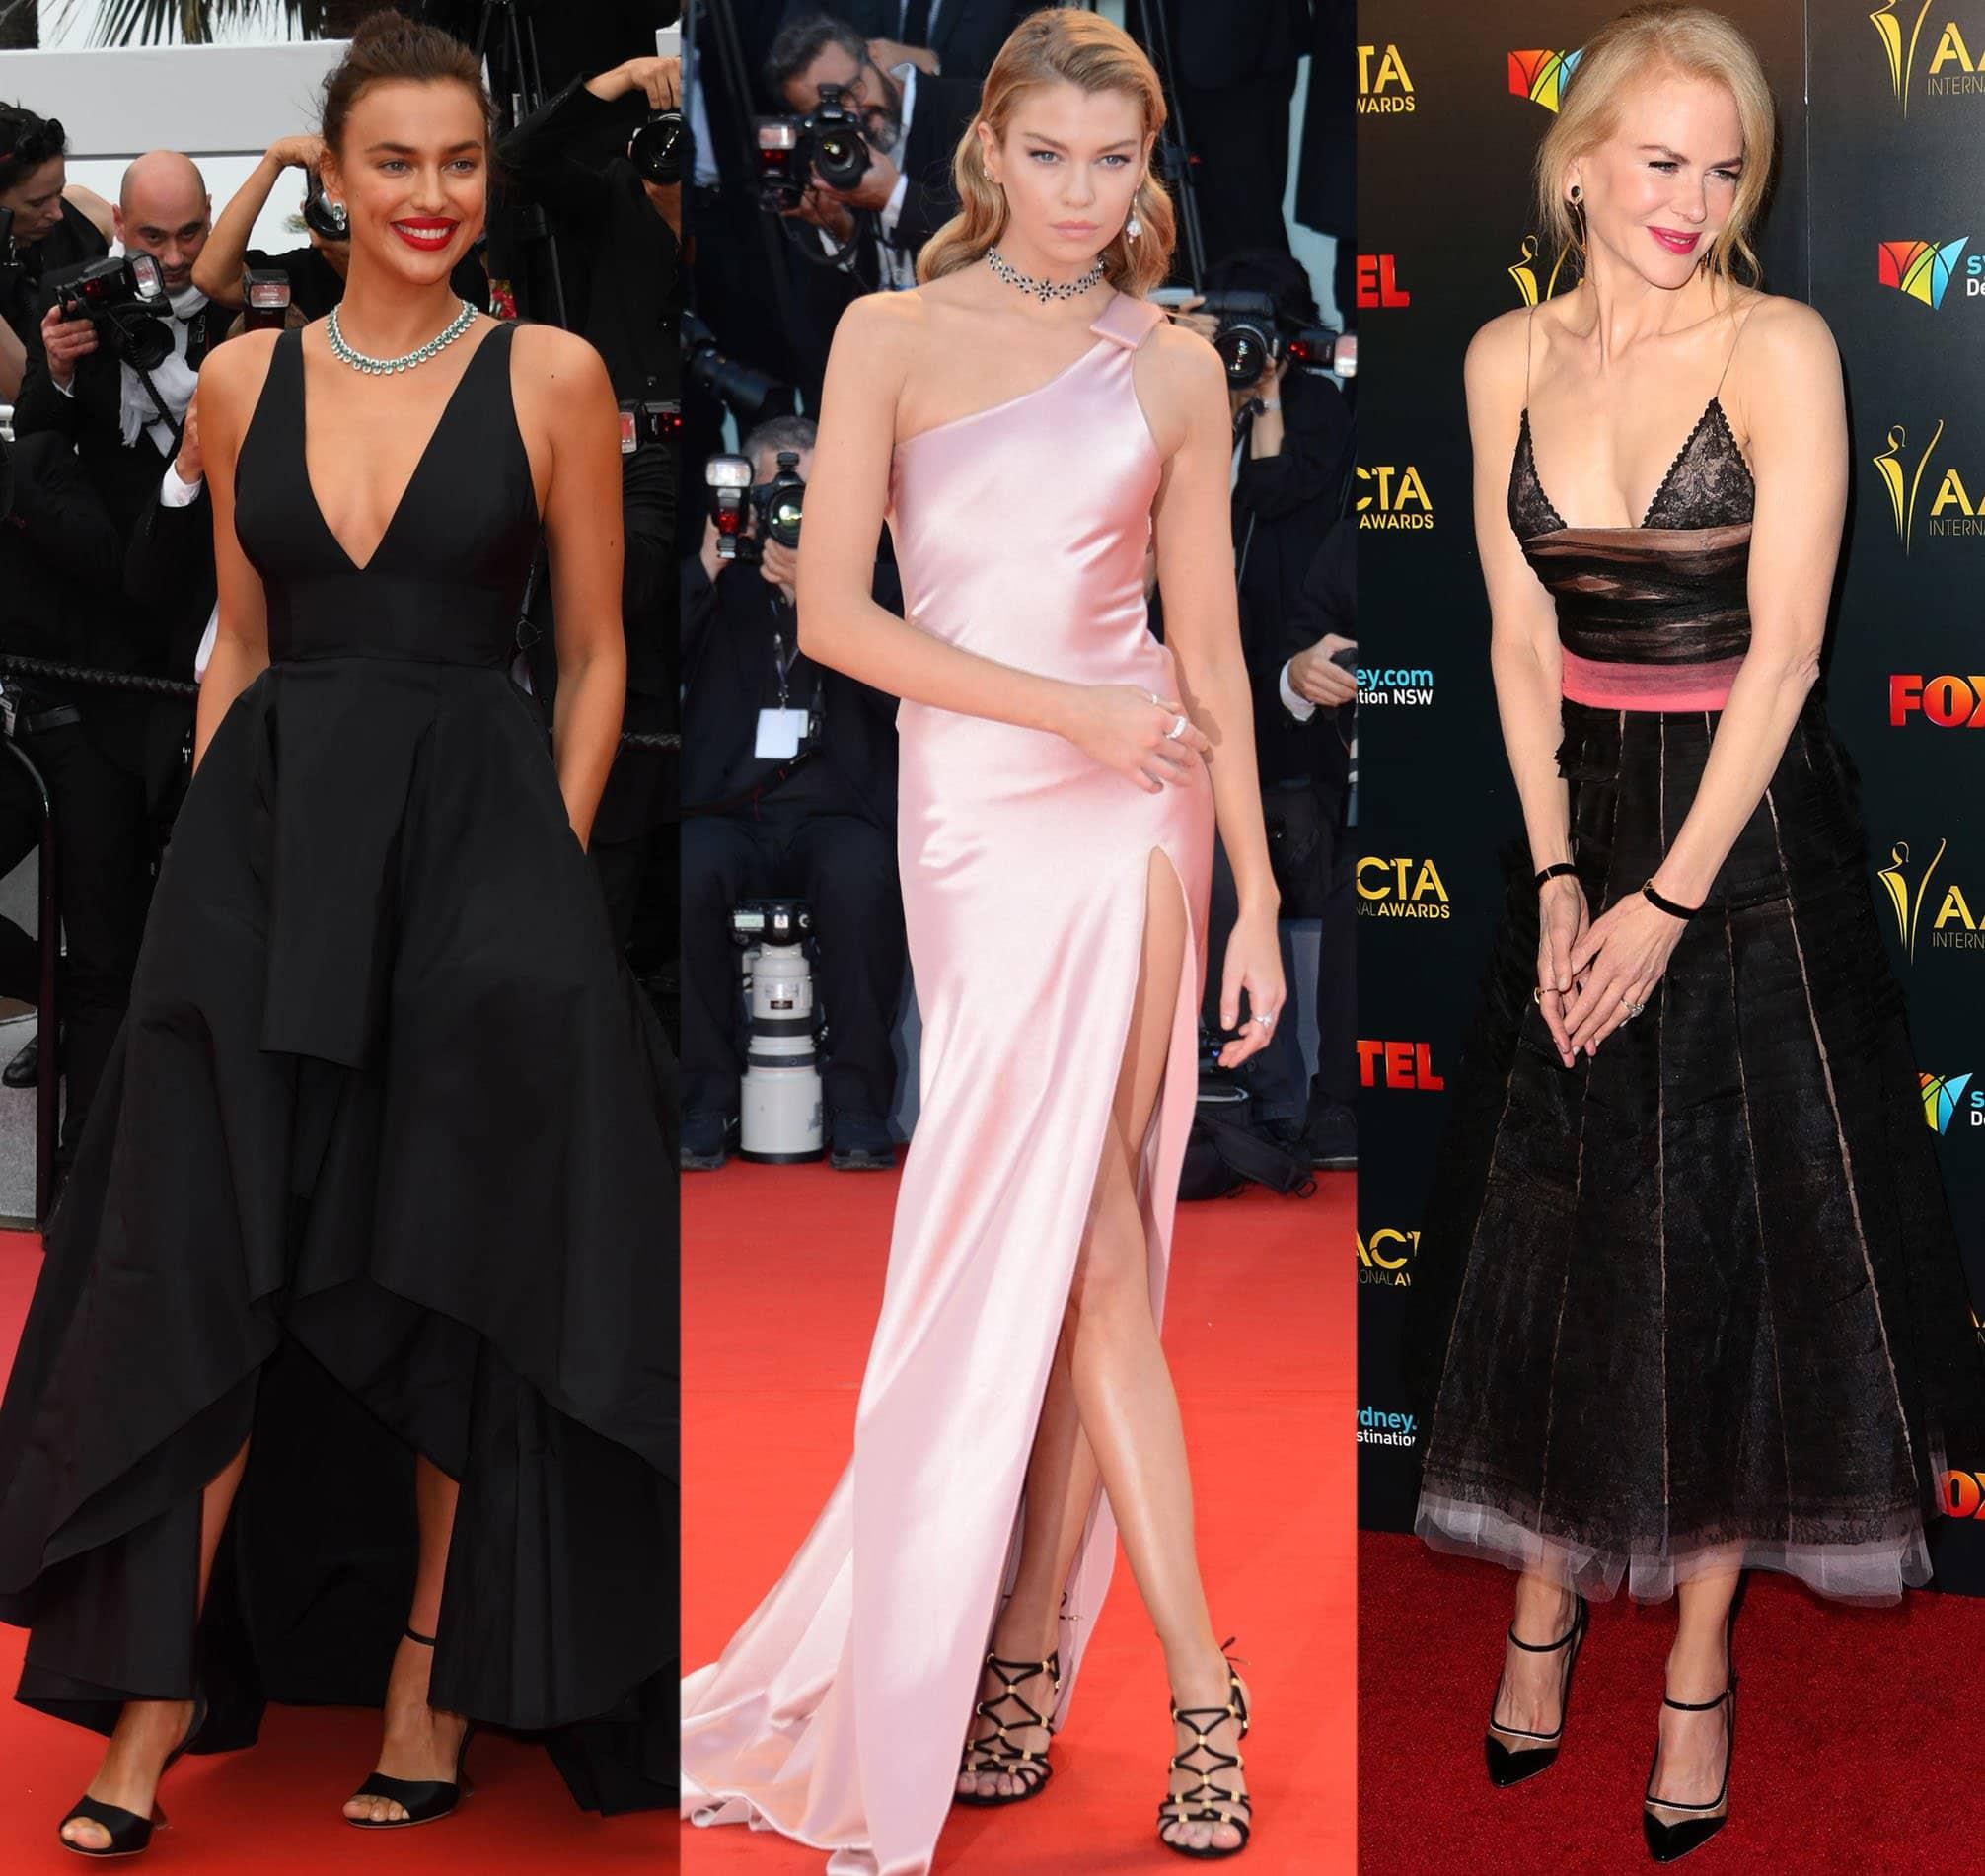 Irina Shayk, Stella Maxwell, and Nicole Kidman sporting Salvatore Ferragamo heels on the red carpet